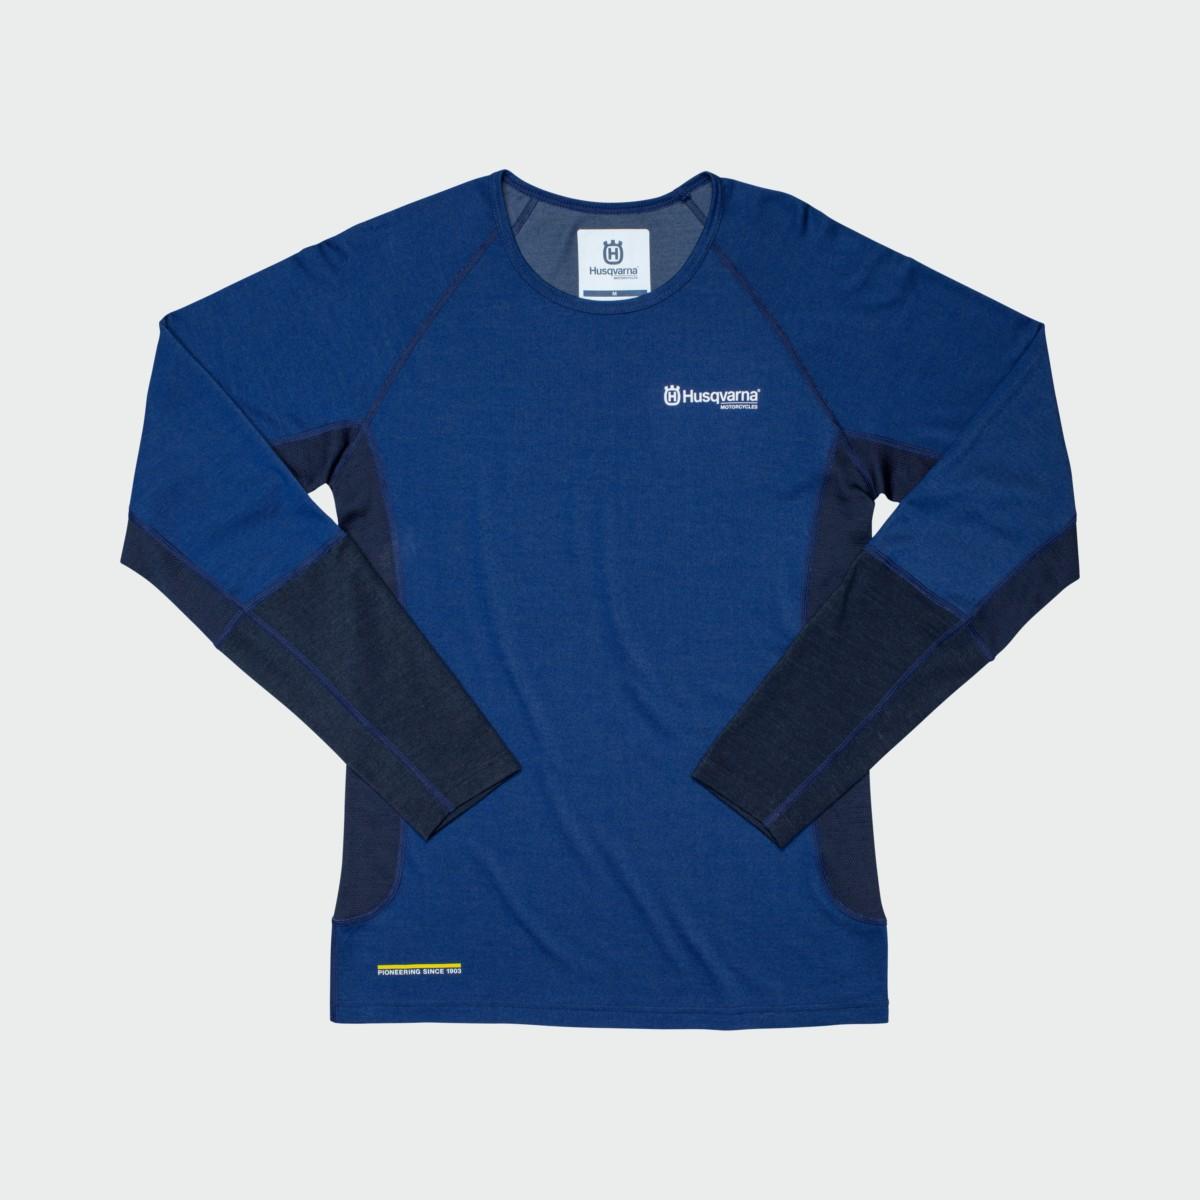 Koszulka funkcyjna Husqvarna